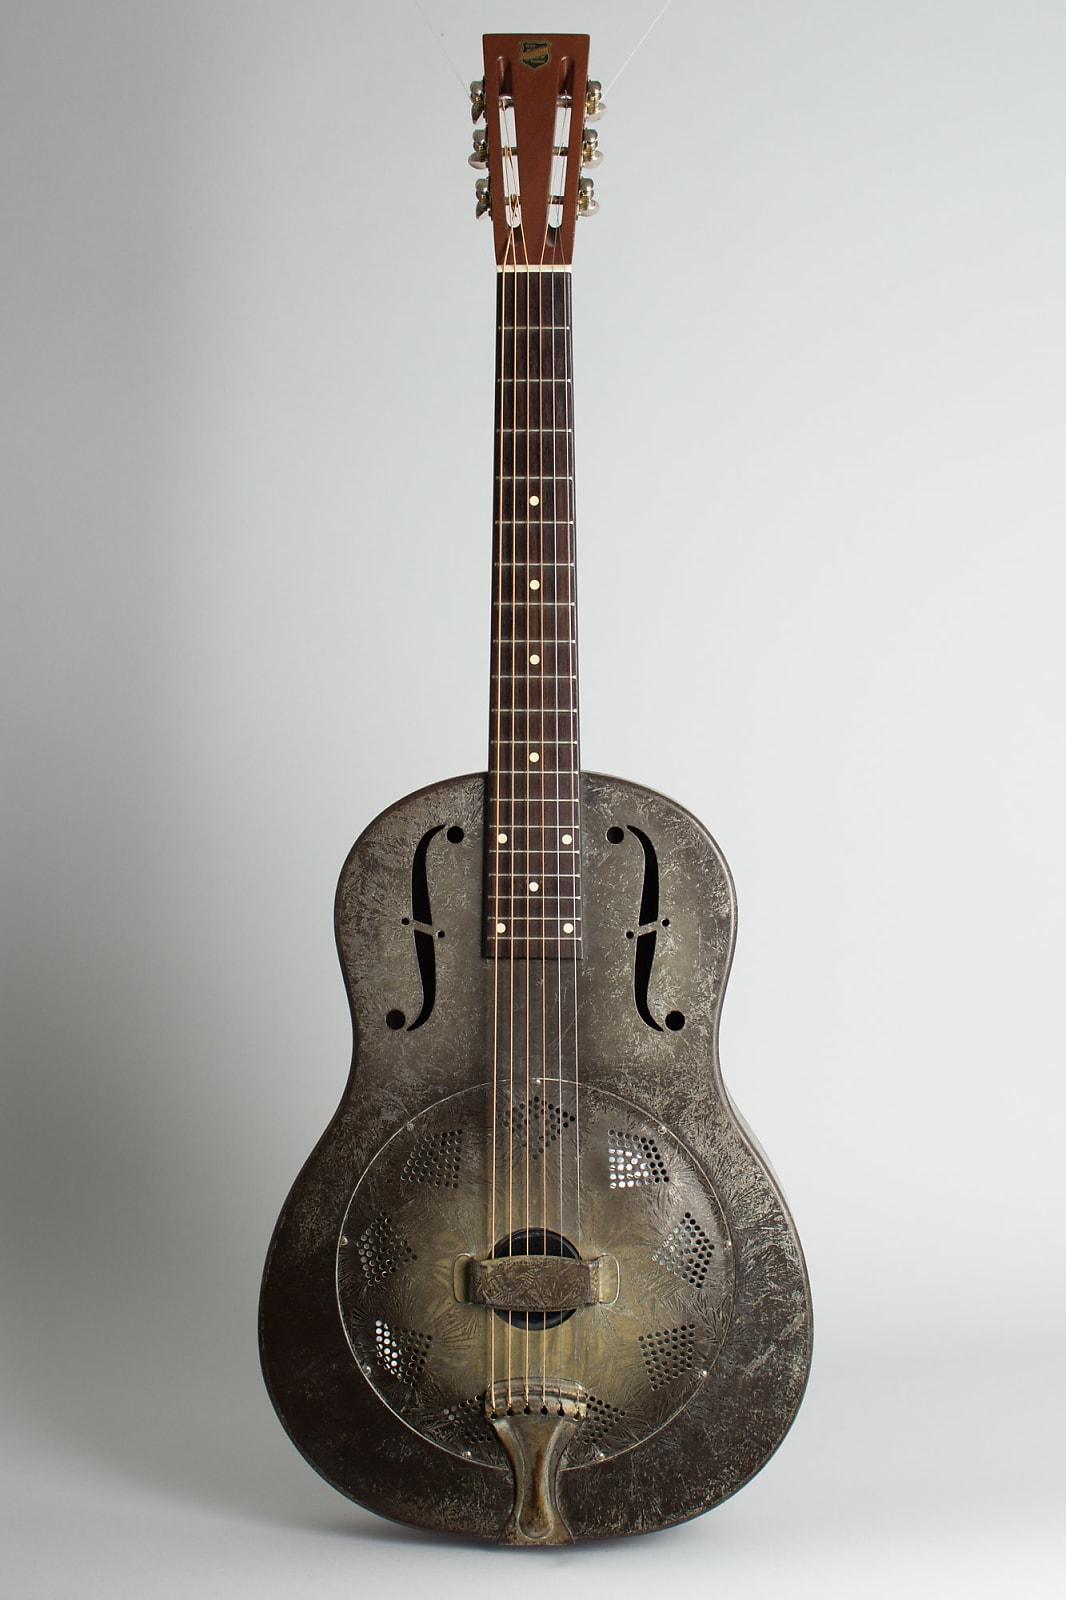 National  Duolian Resophonic Guitar (1931), ser. #C-1551, brown hard shell case.